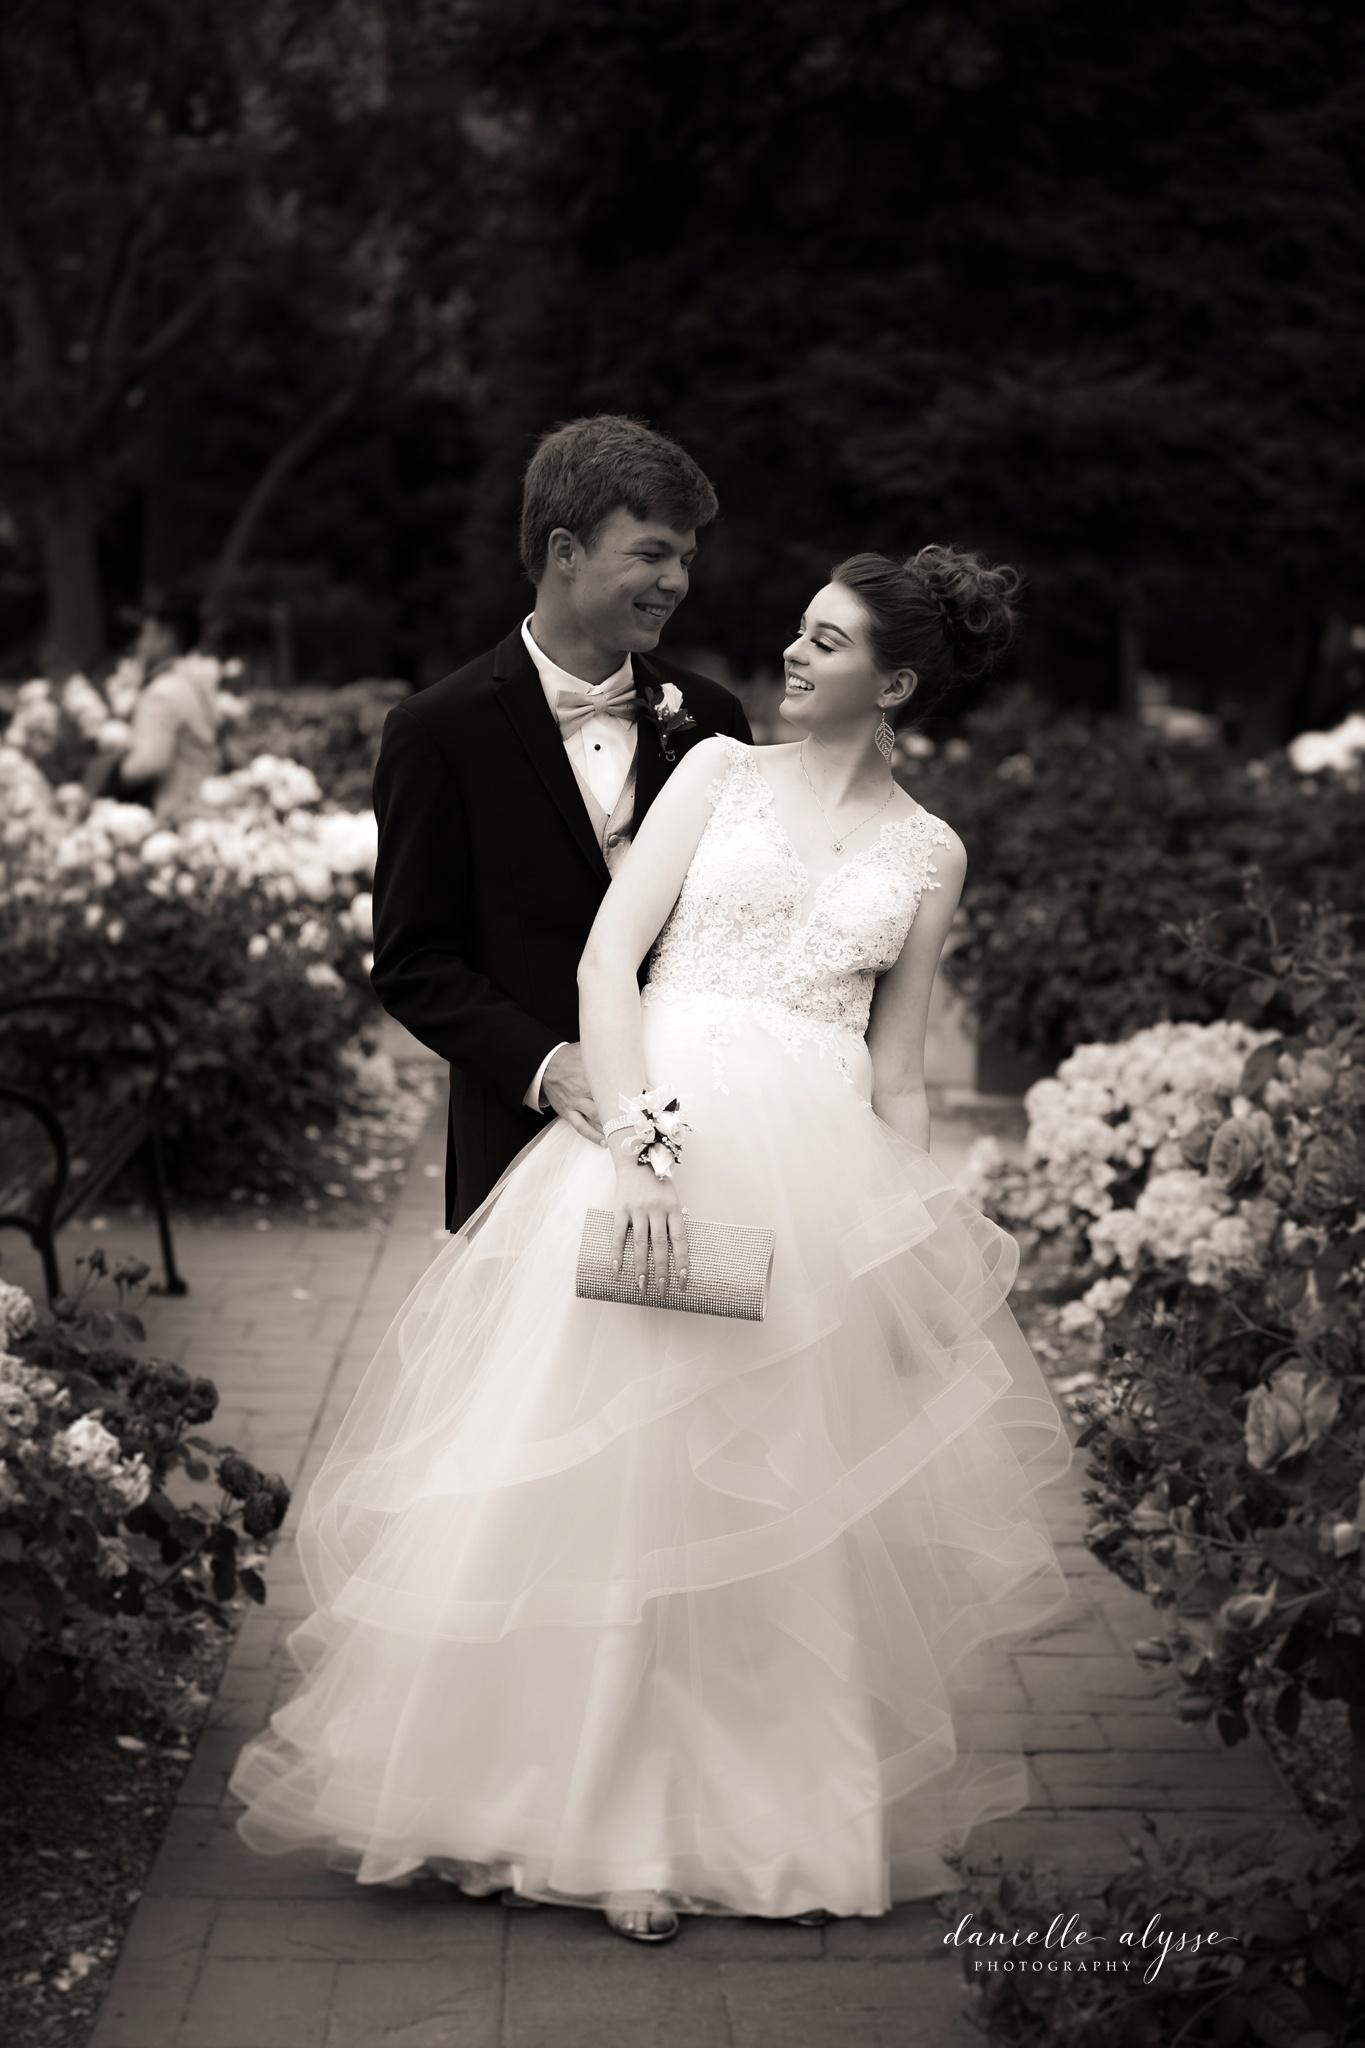 180428_prom_senior_ball_capitol_rose_danielle_alysse_photography_sacramento_photographer_blog_9_WEB.jpg